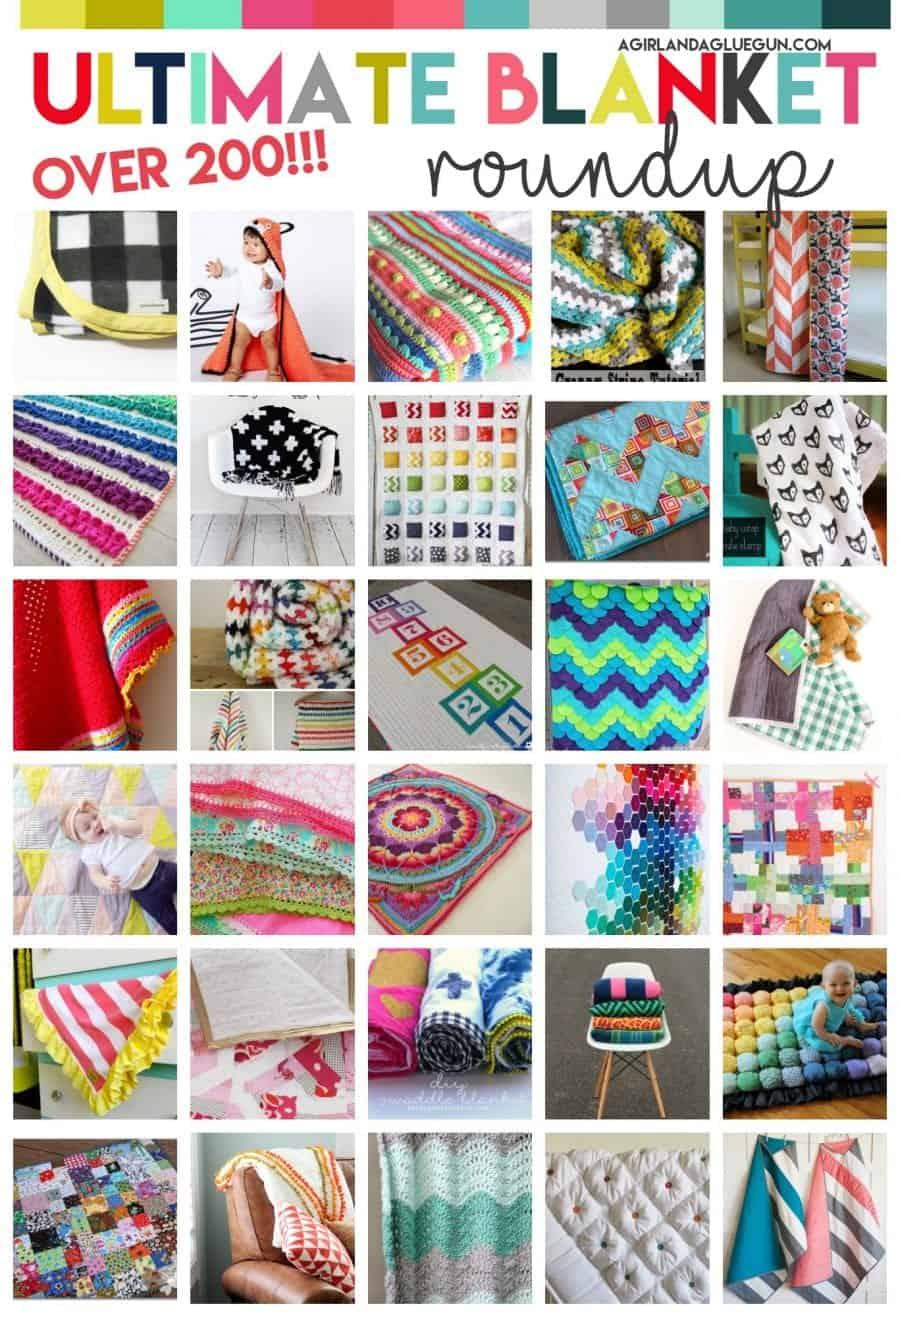 over 200 amazing blankets